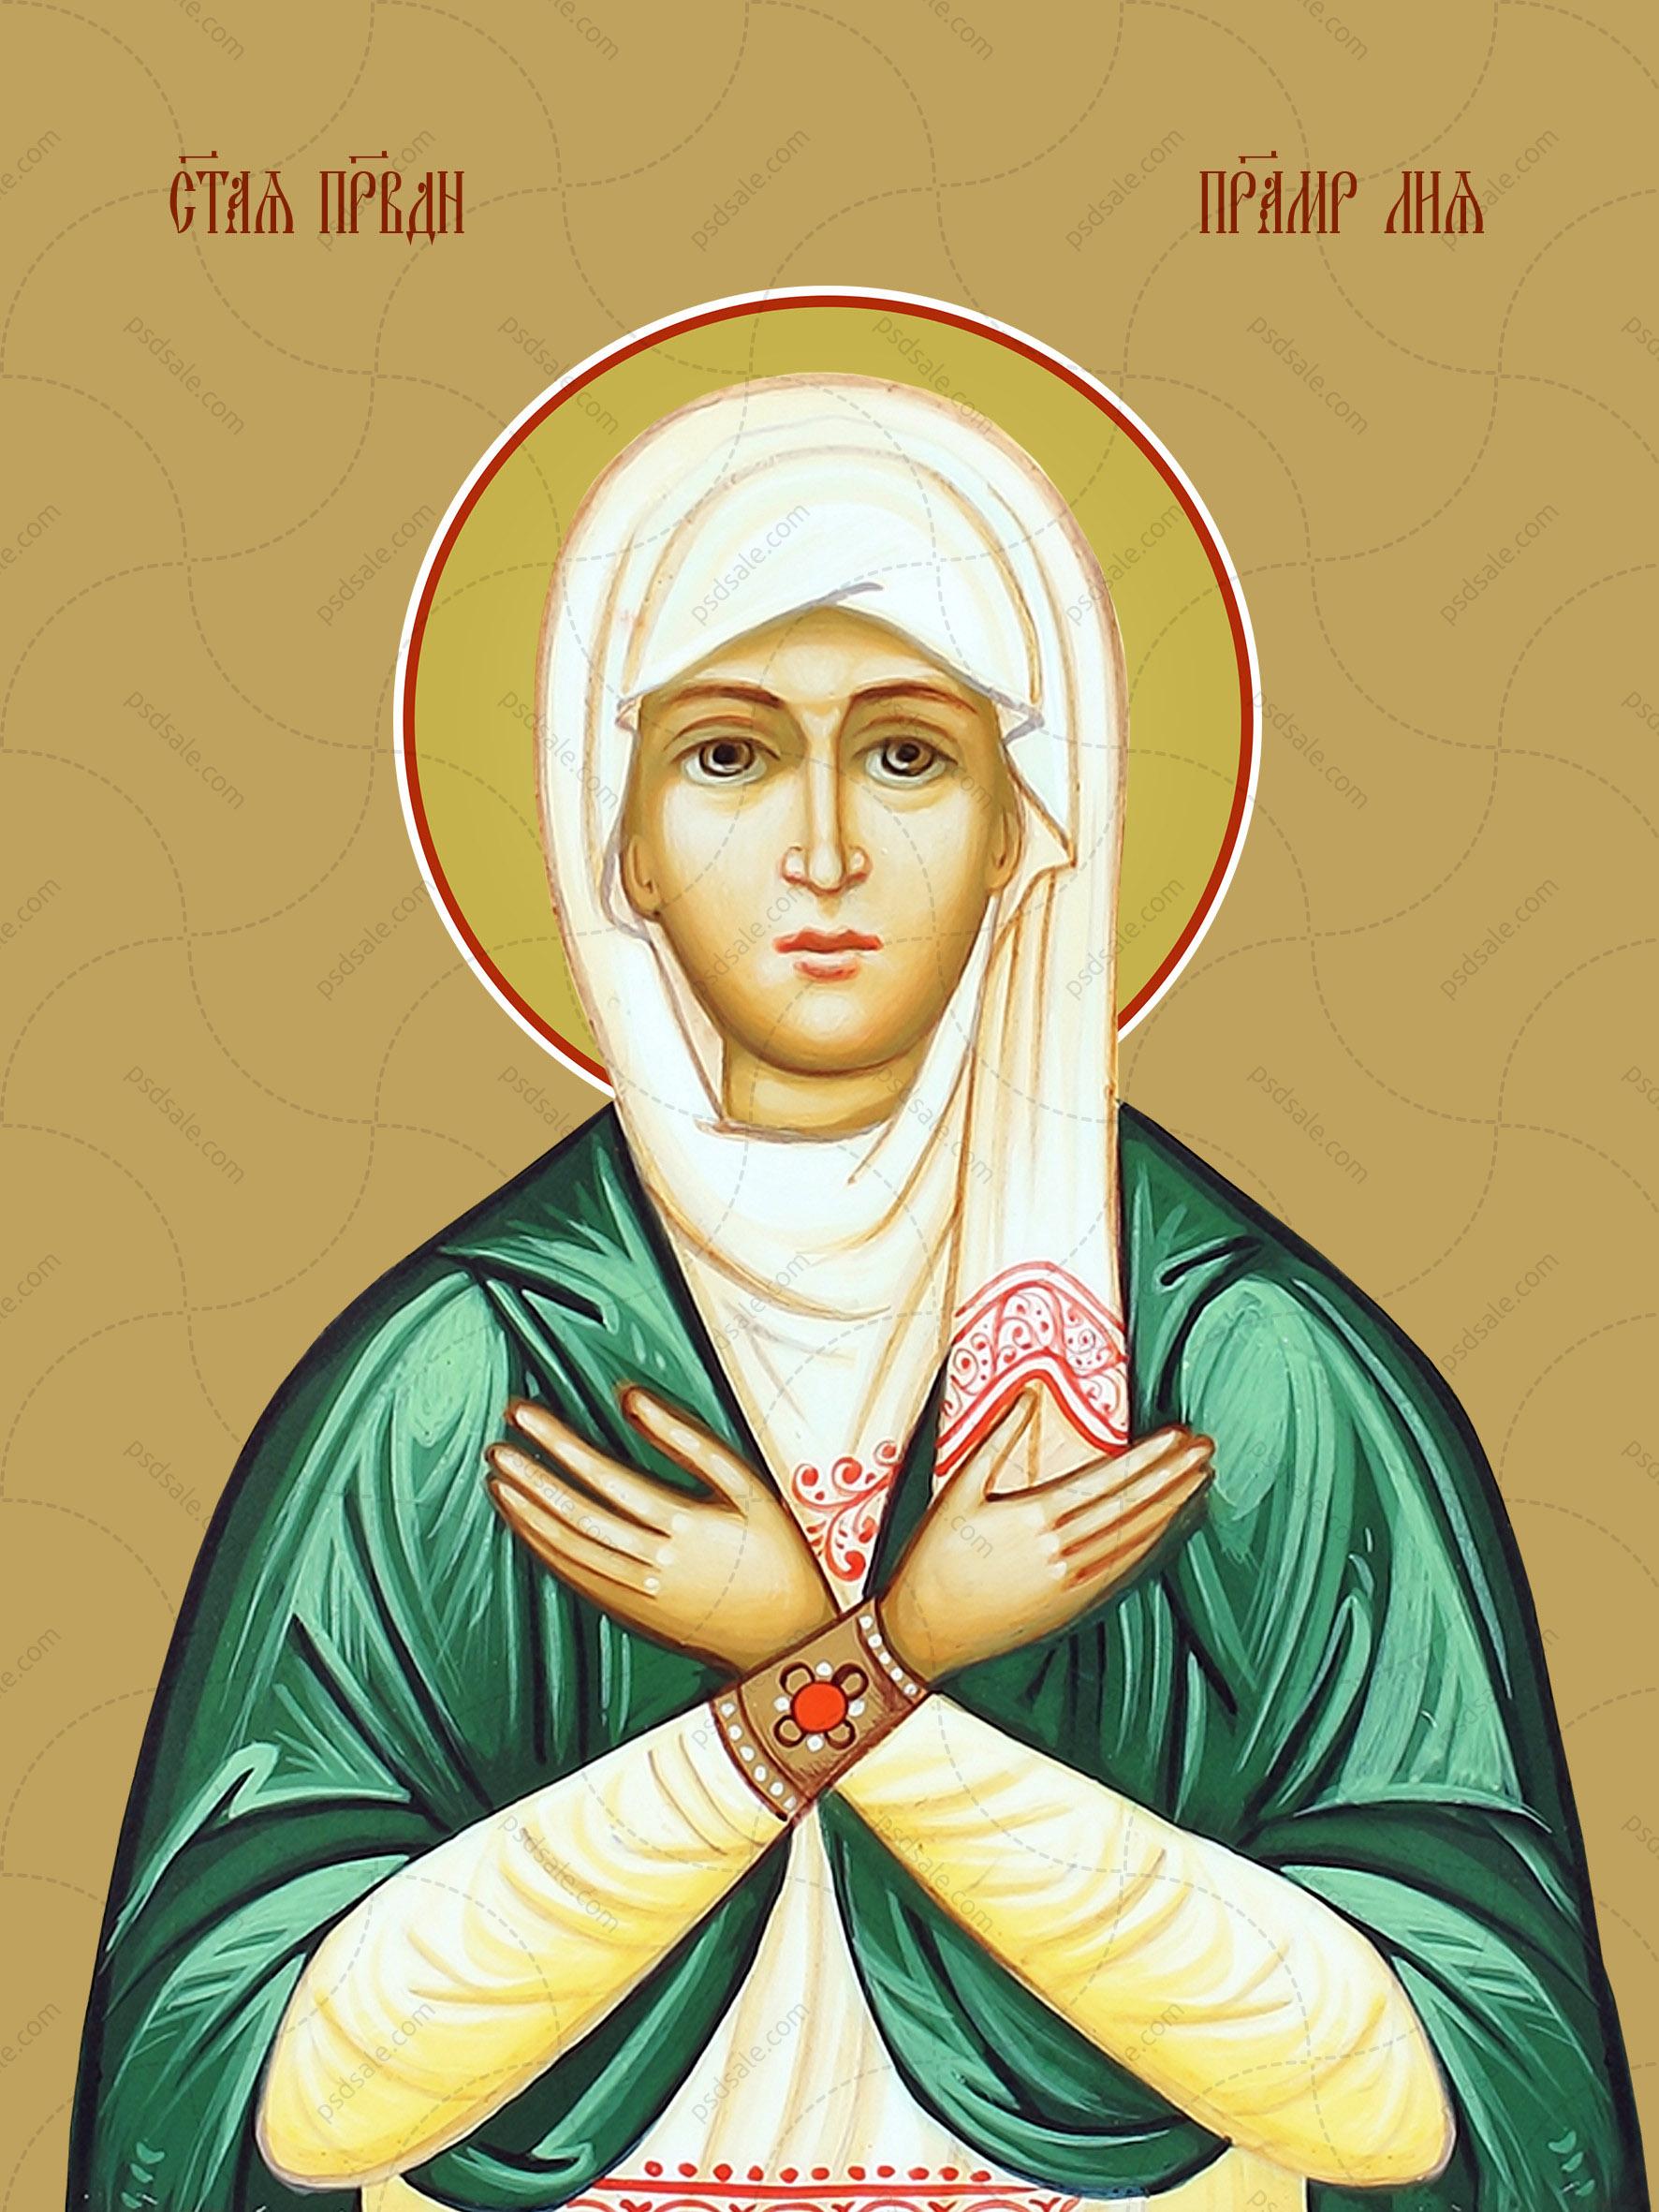 Лия, святая праведная праматерь